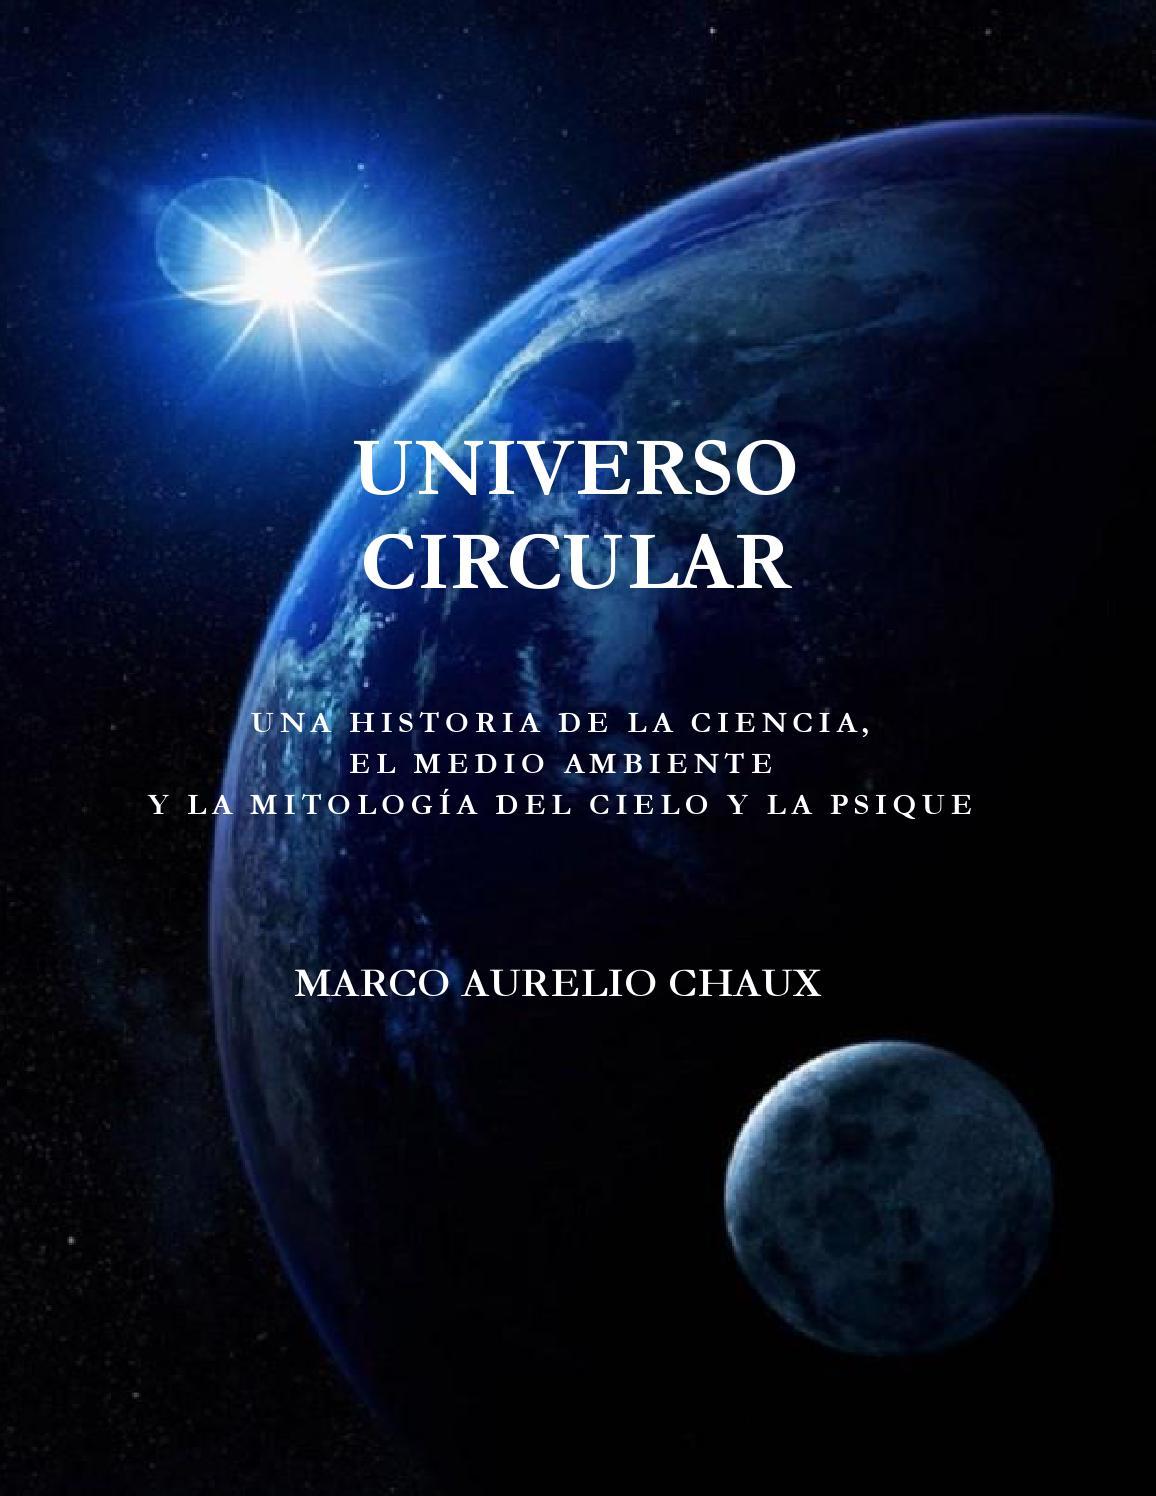 Universo circular by Marco Aurelio Chaux - issuu